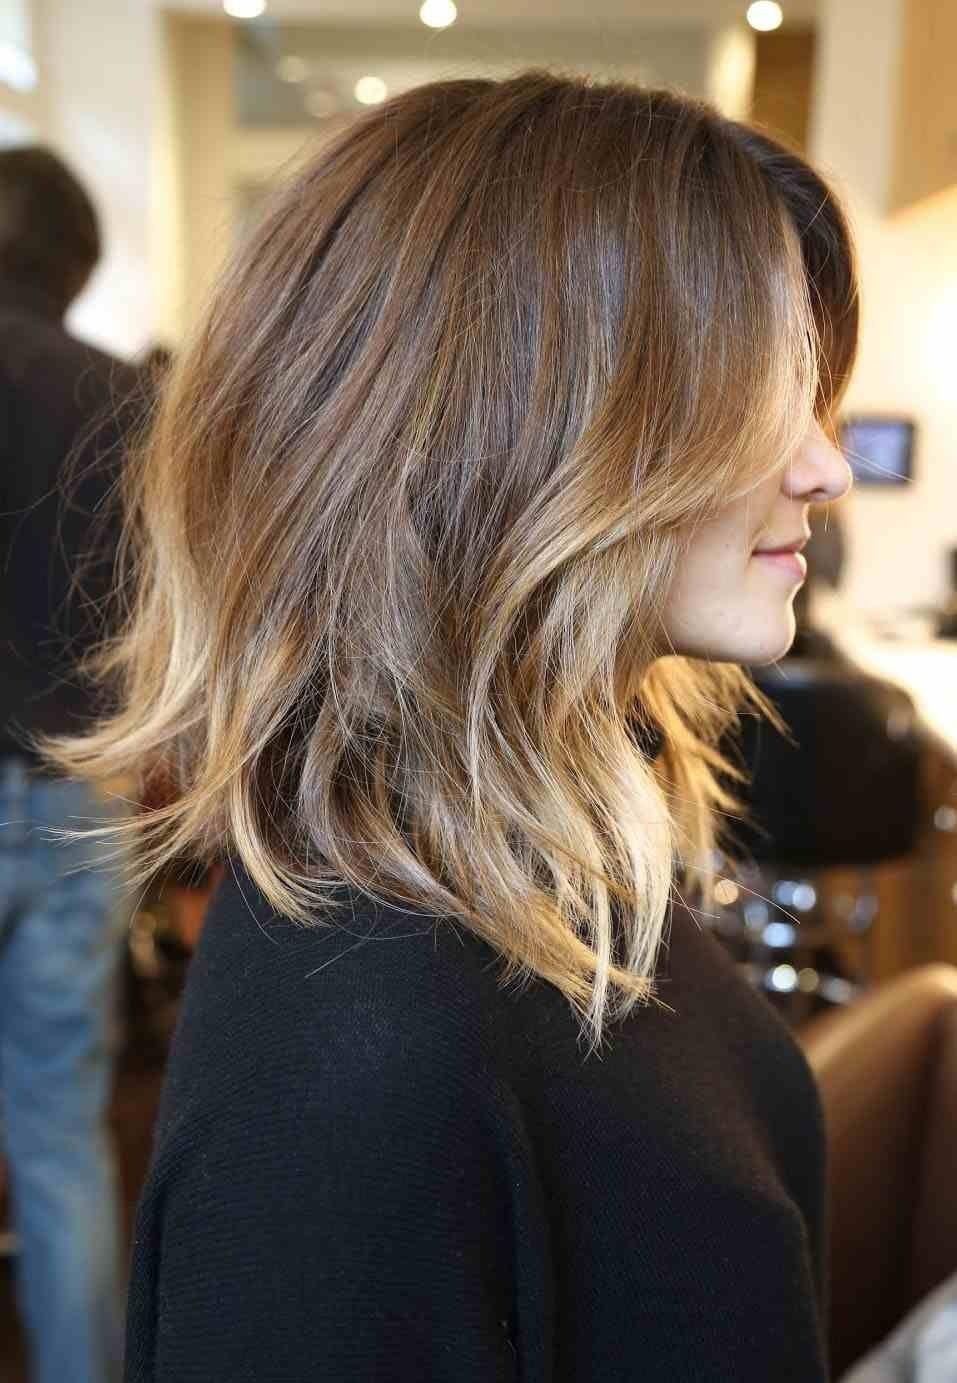 Medium length ombre gorgeous cut gosh i want my hair to grow